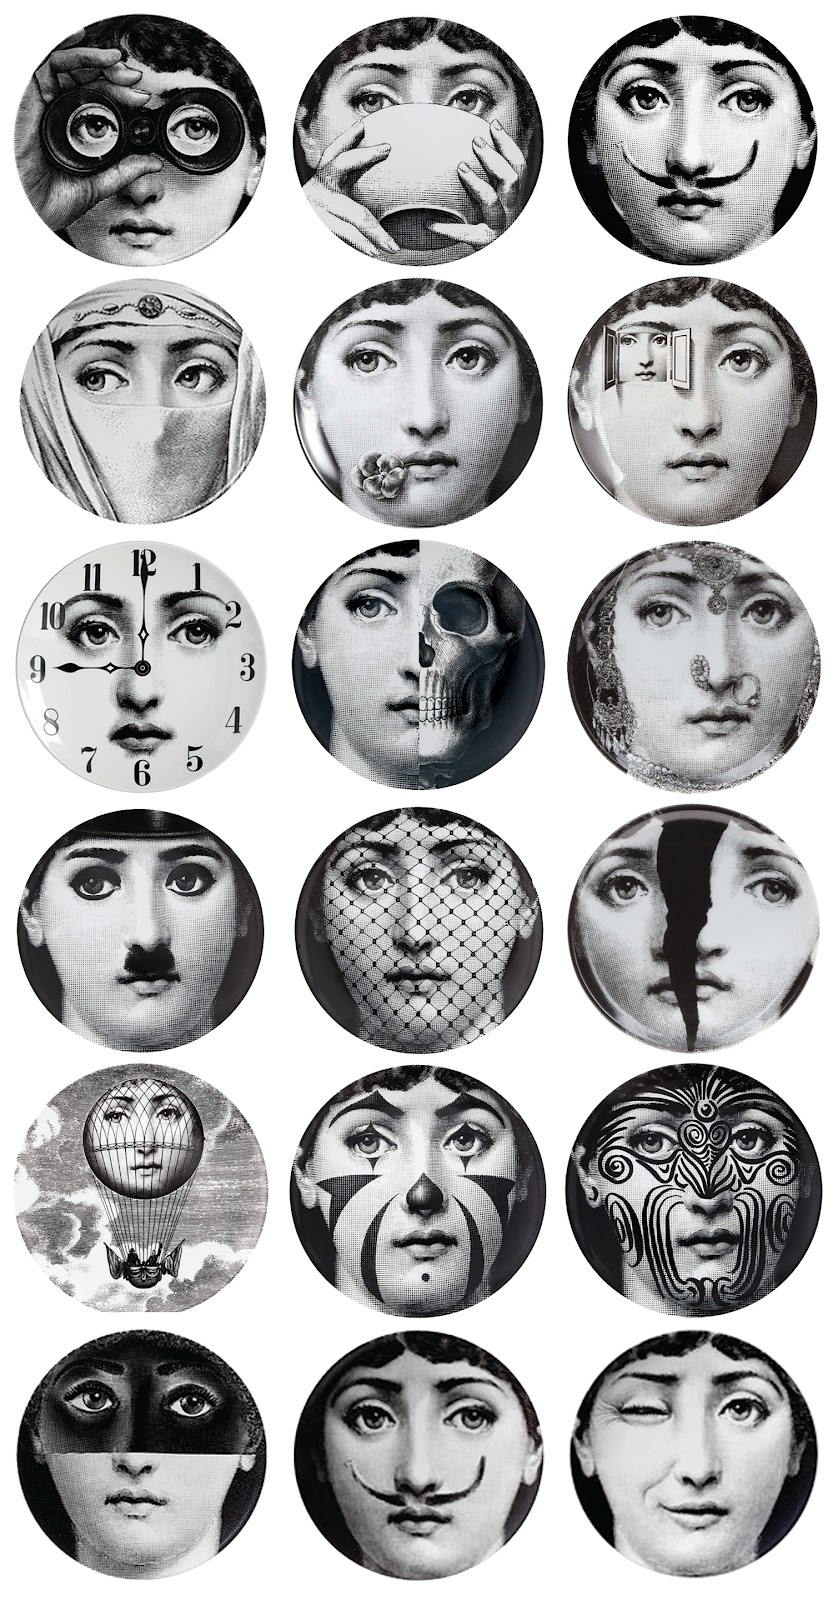 48 Fornasetti Faces Wallpaper On